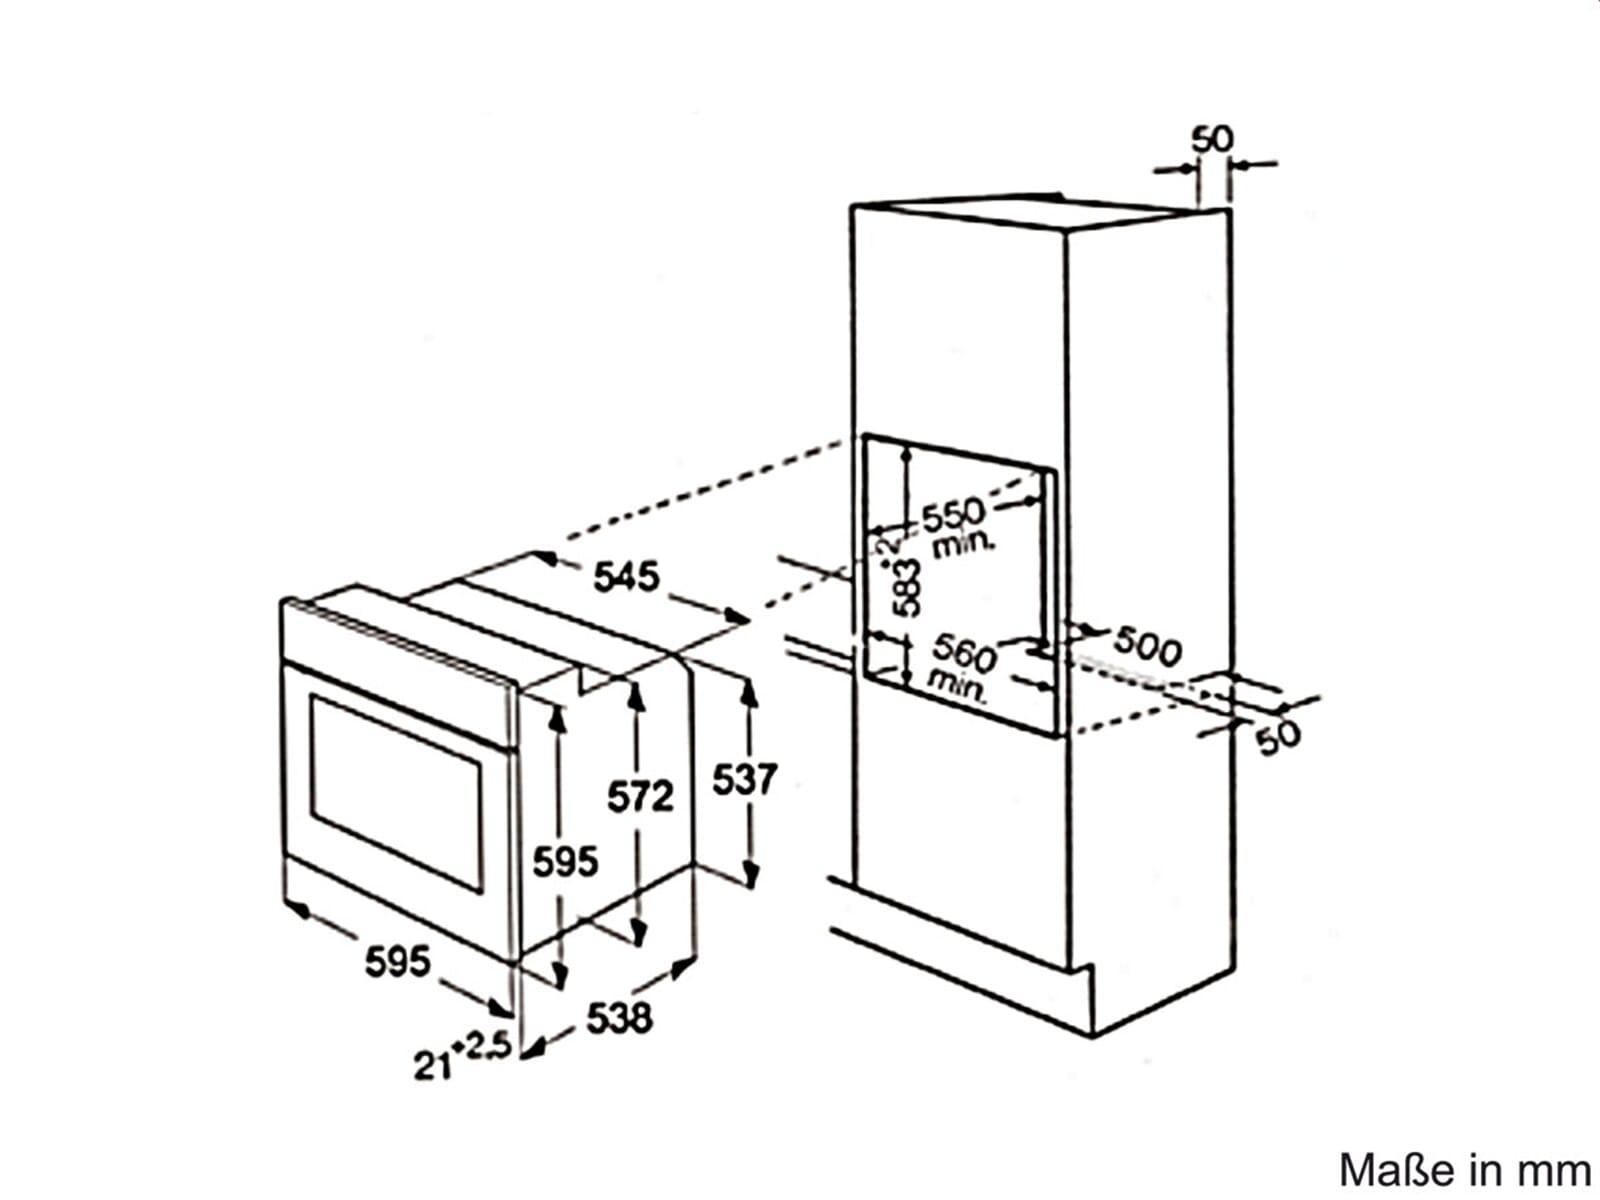 whirlpool akz 549 ix pyrolyse backofen edelstahl einbau 60 cm. Black Bedroom Furniture Sets. Home Design Ideas